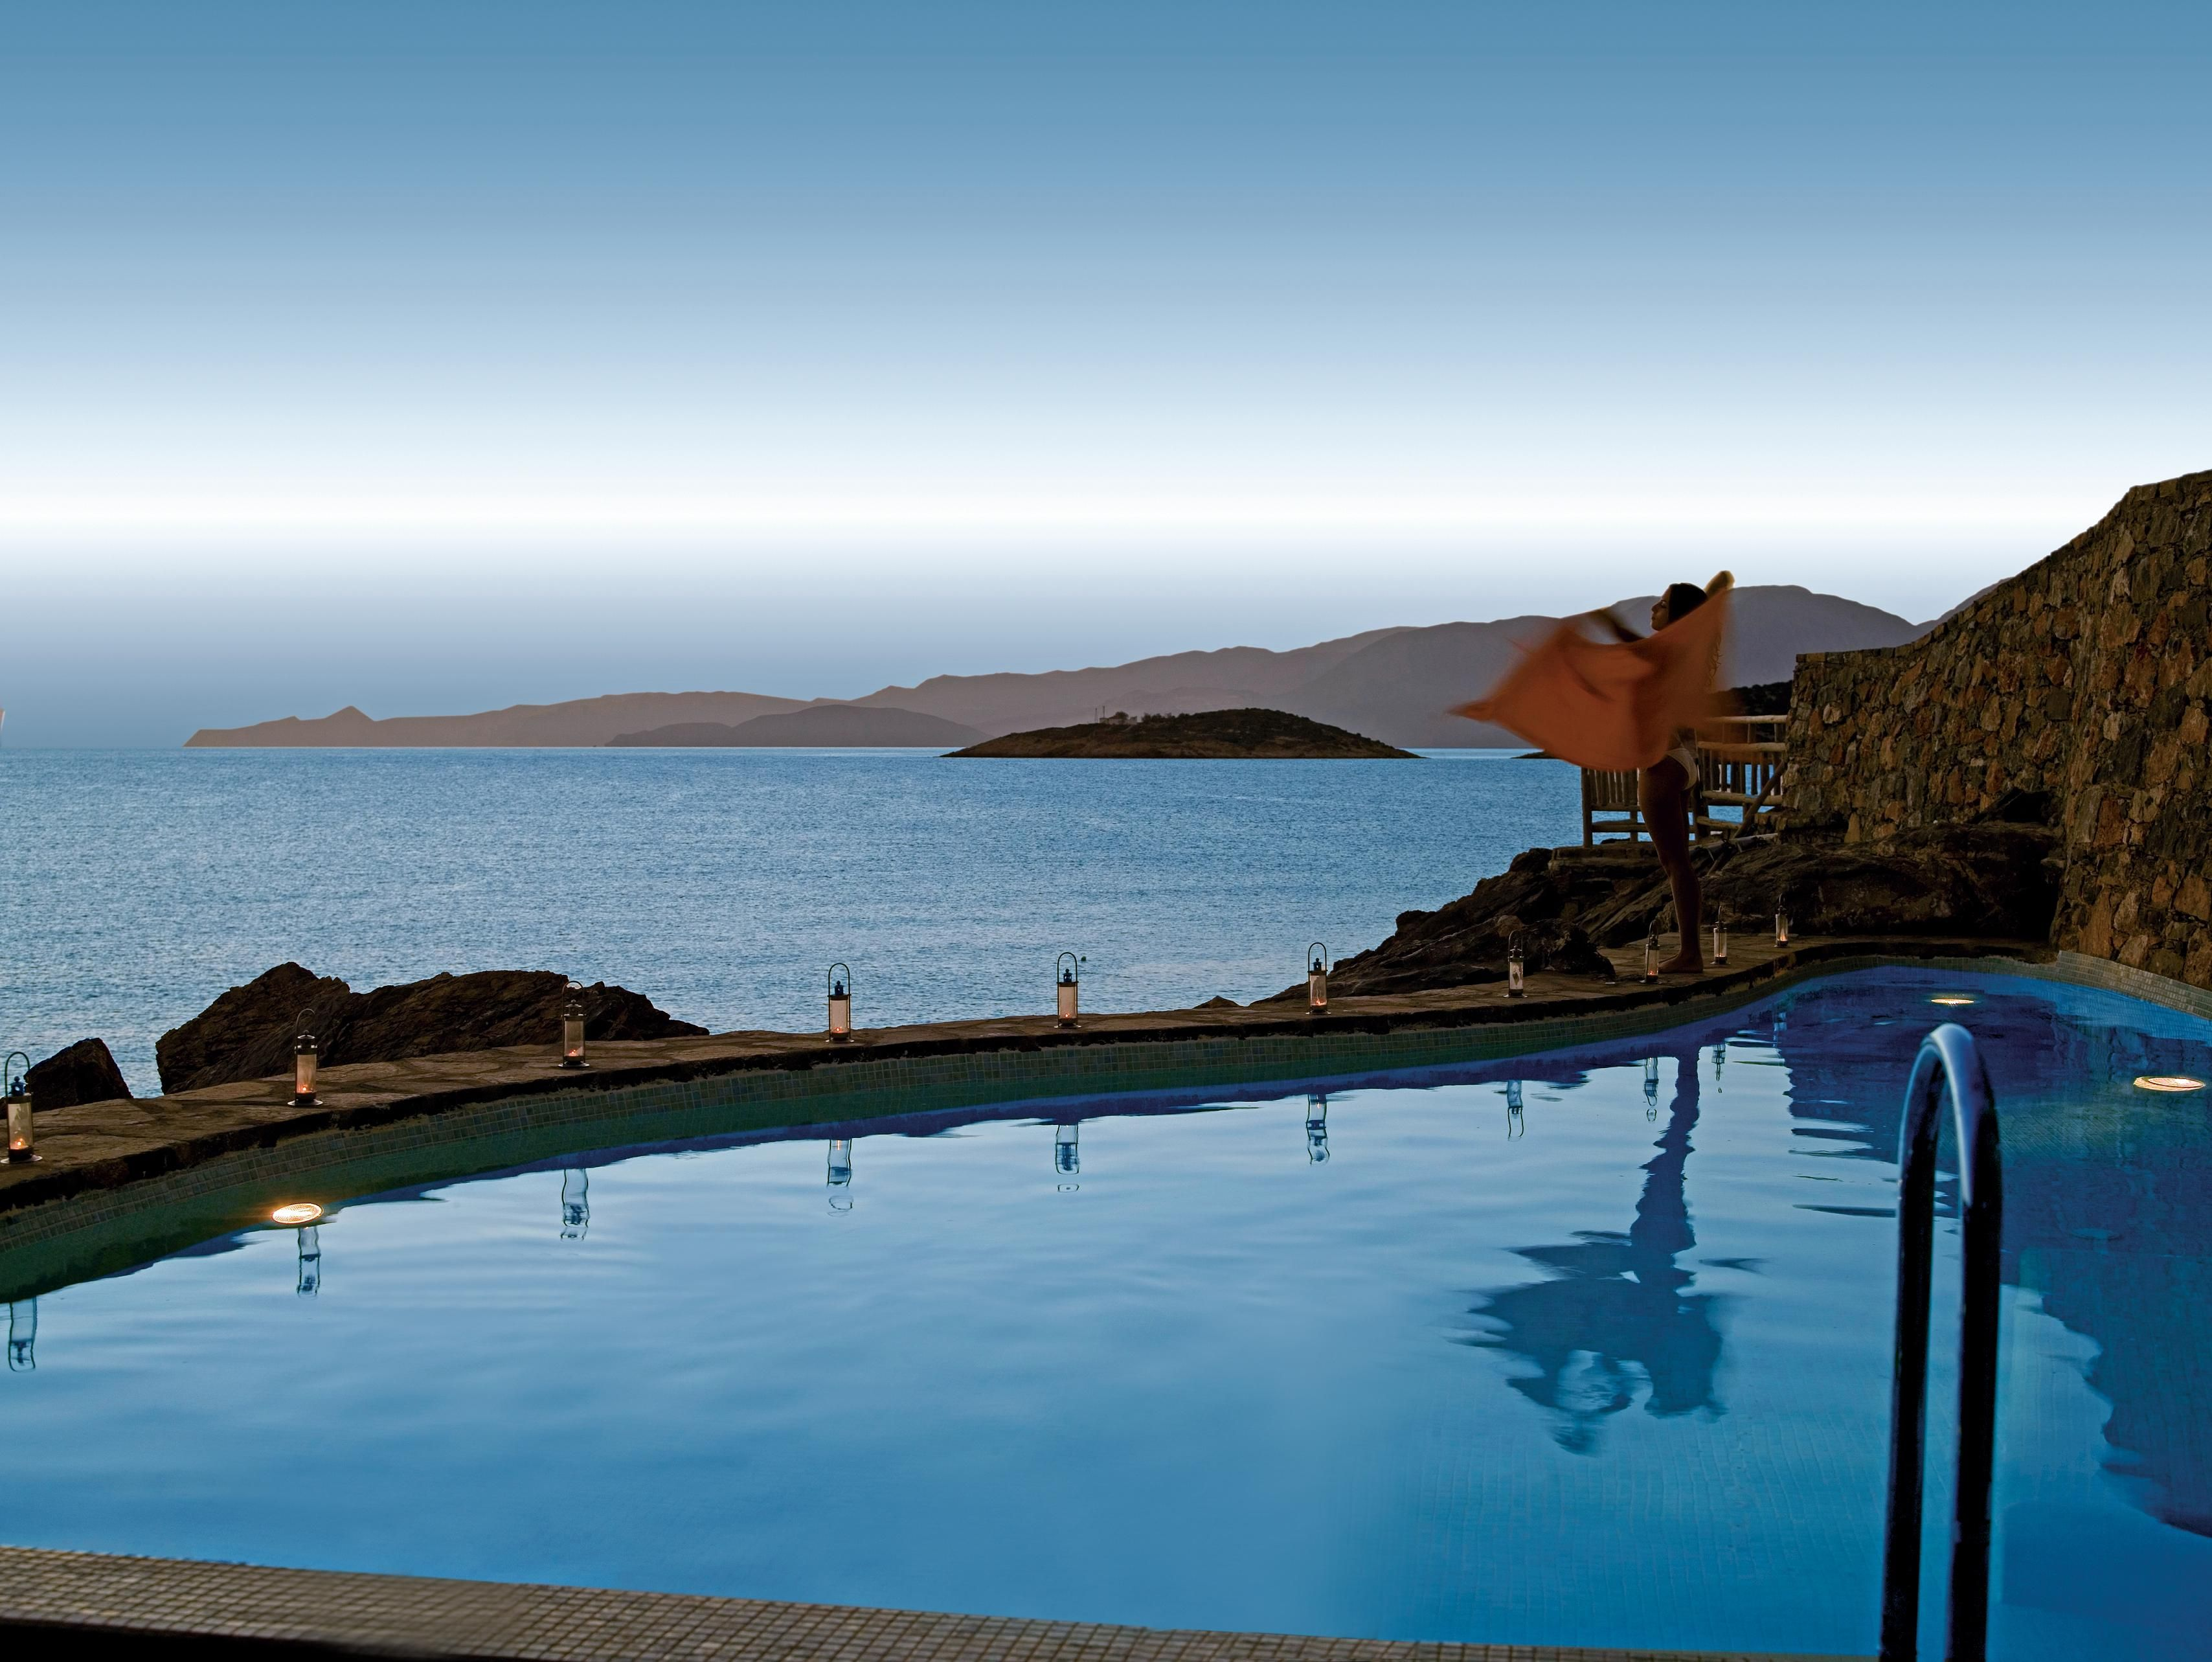 St Nicolas Bay Resort Hotel Villas Aghios Nikolaos Crete Greece Hotels And Resorts Unique Hotels Places To Visit